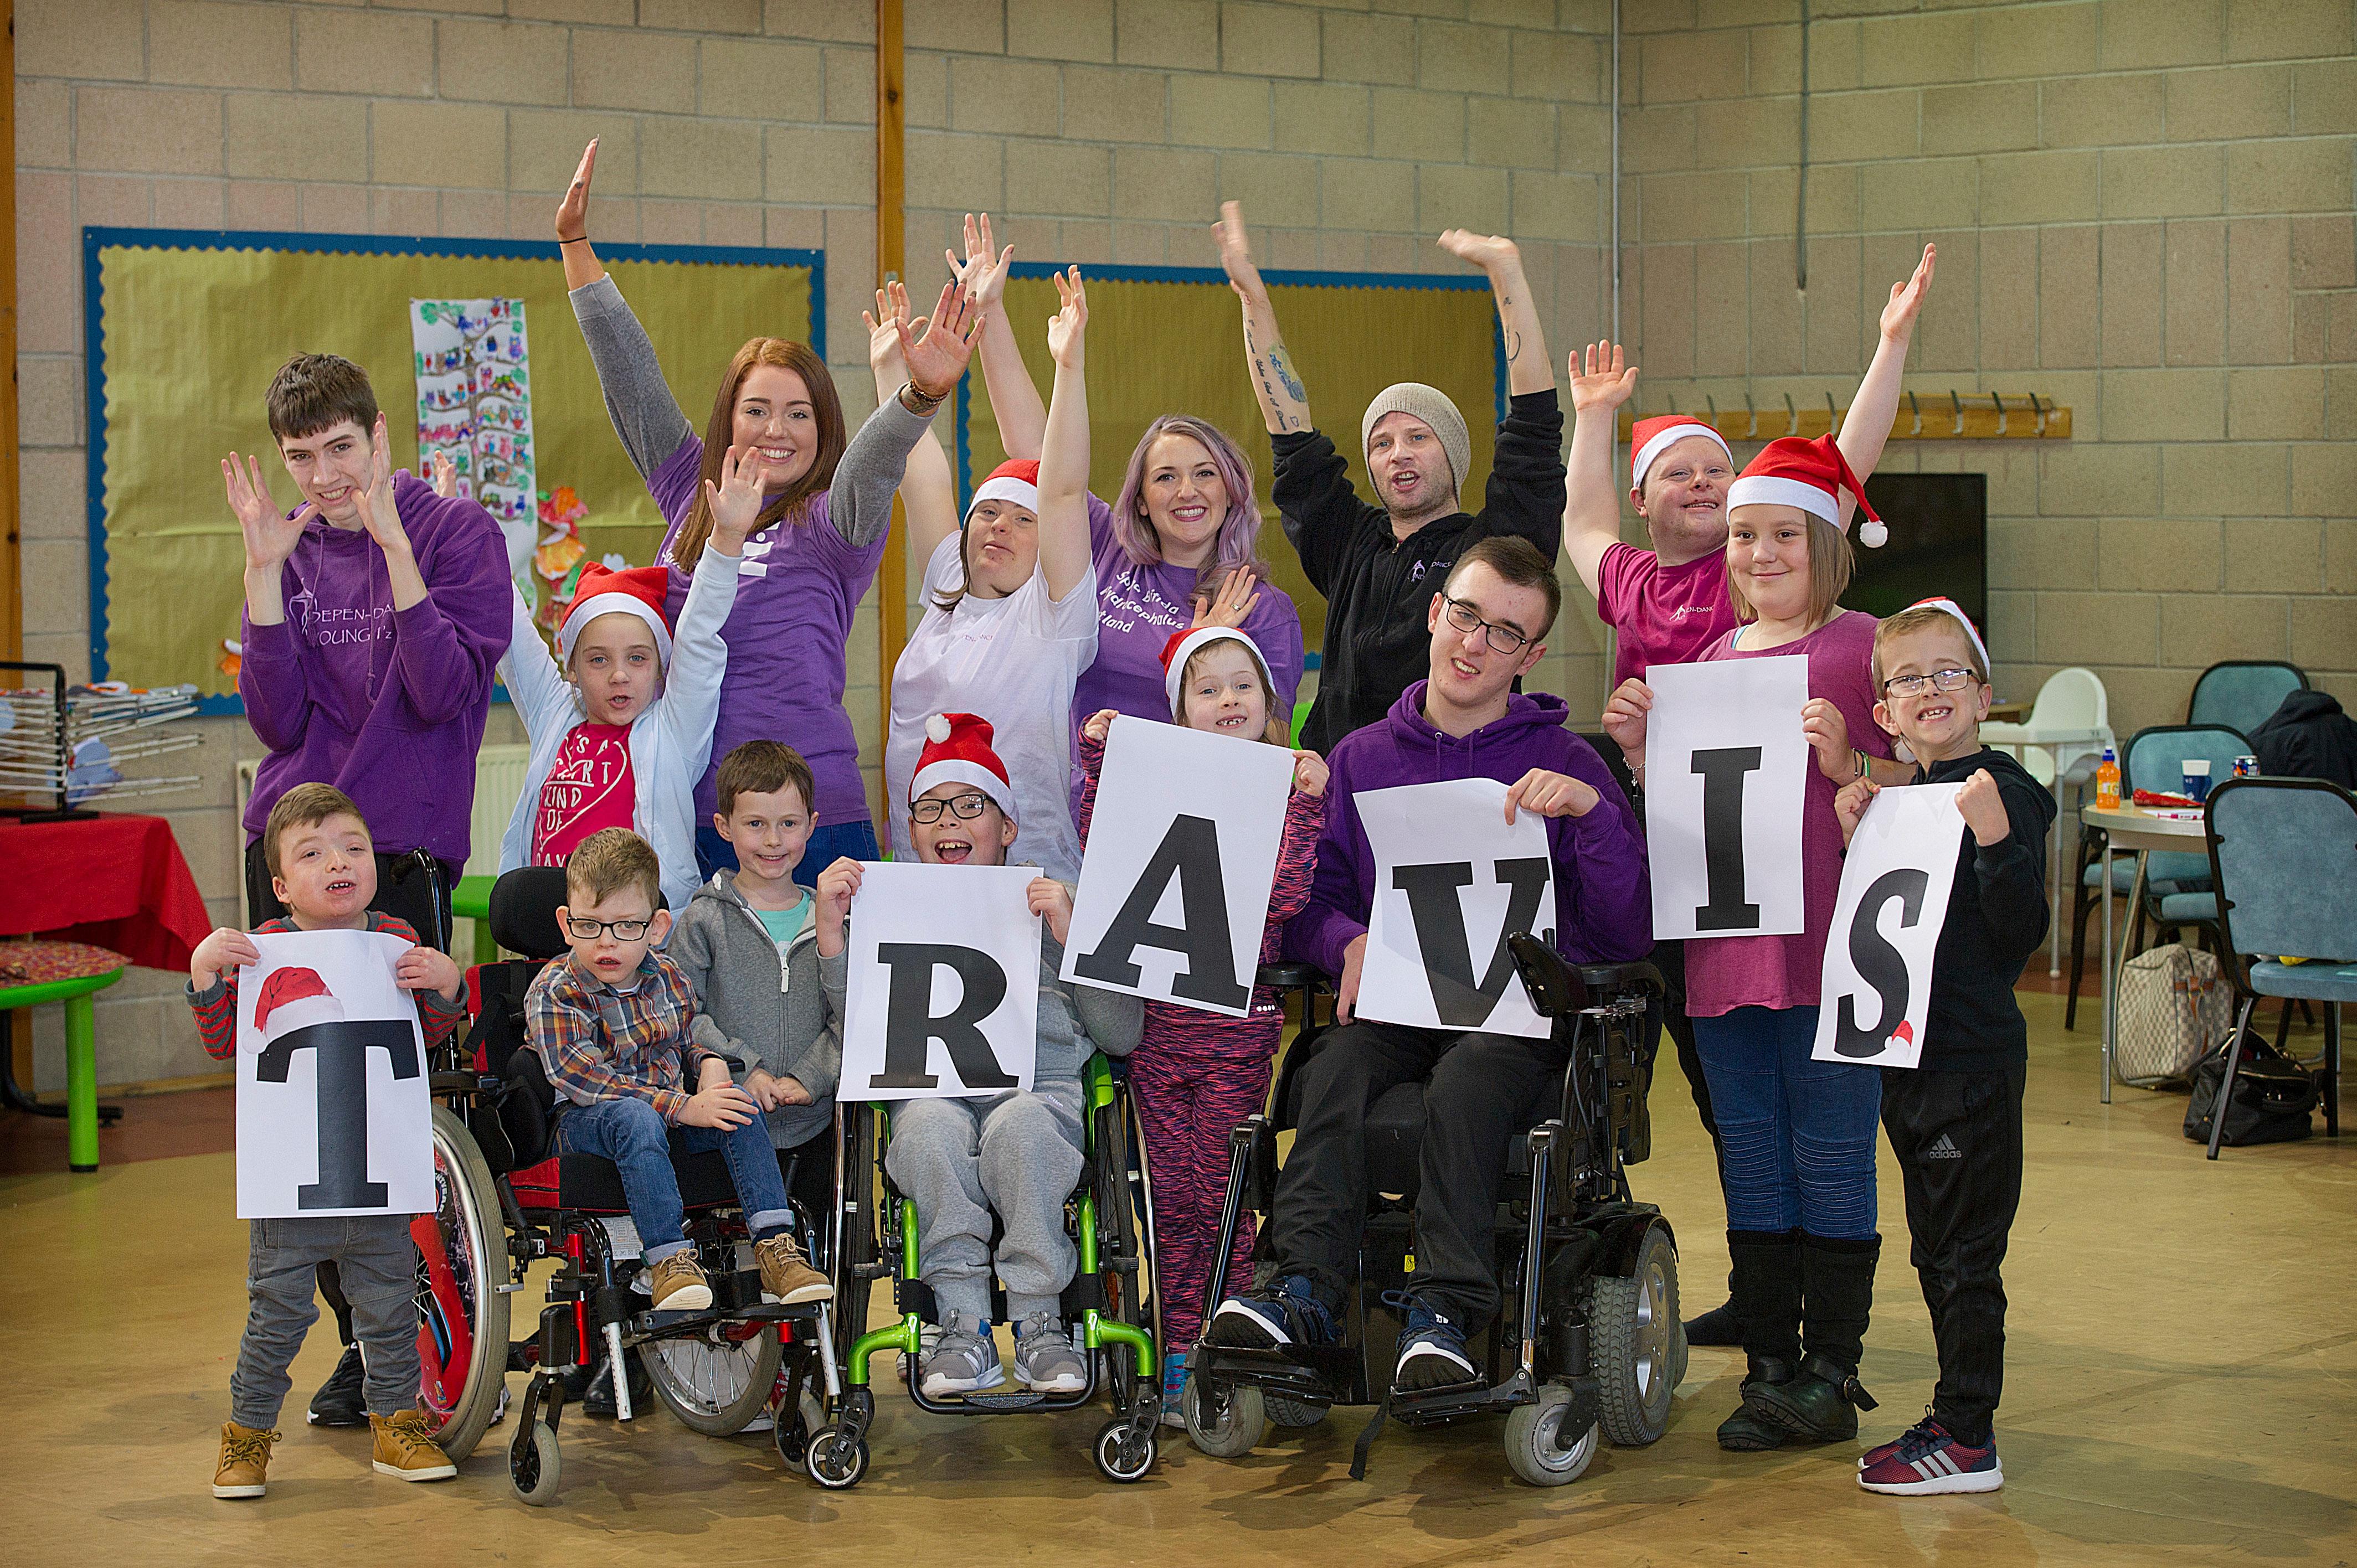 SBH Scotland staff and children celebrating Travis Del Amitri Christmas single